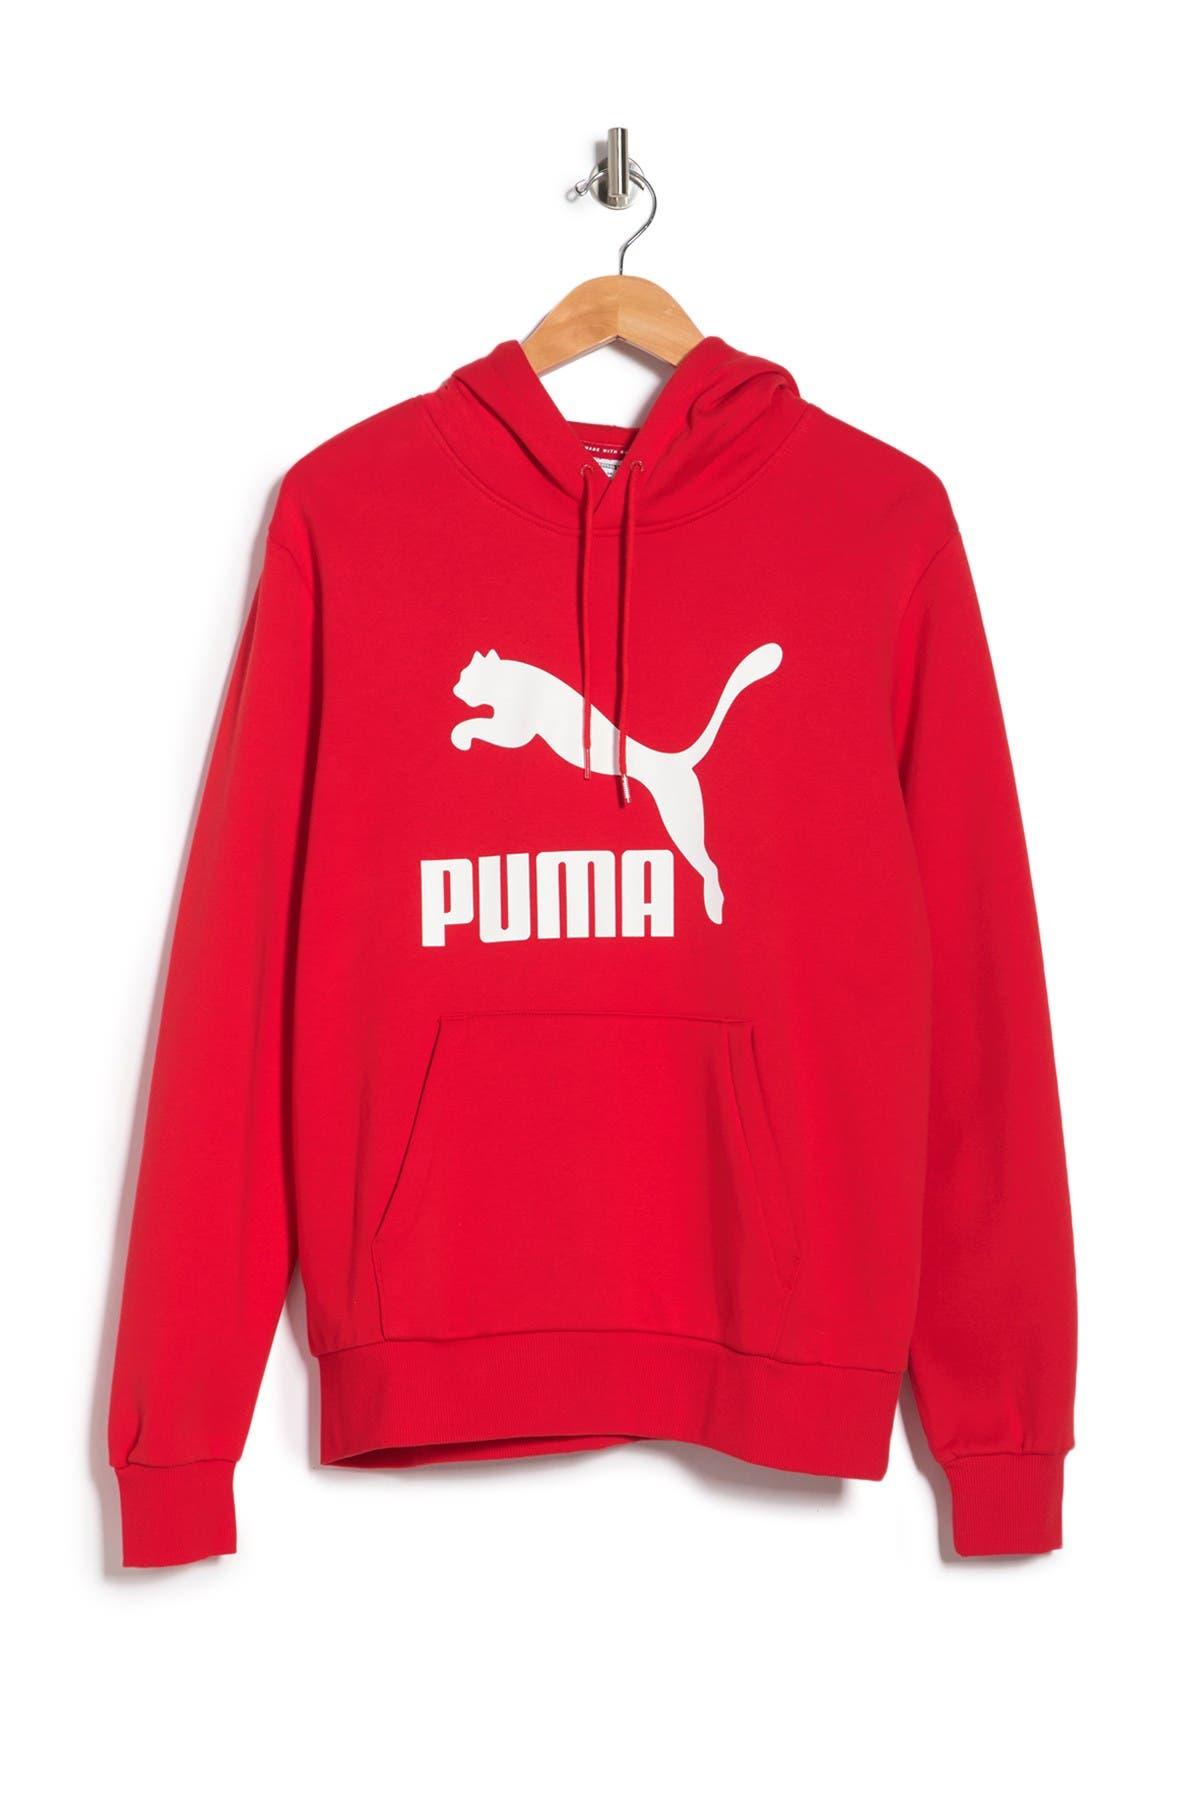 Image of PUMA Classics Logo Fleece Pullover Hoodie